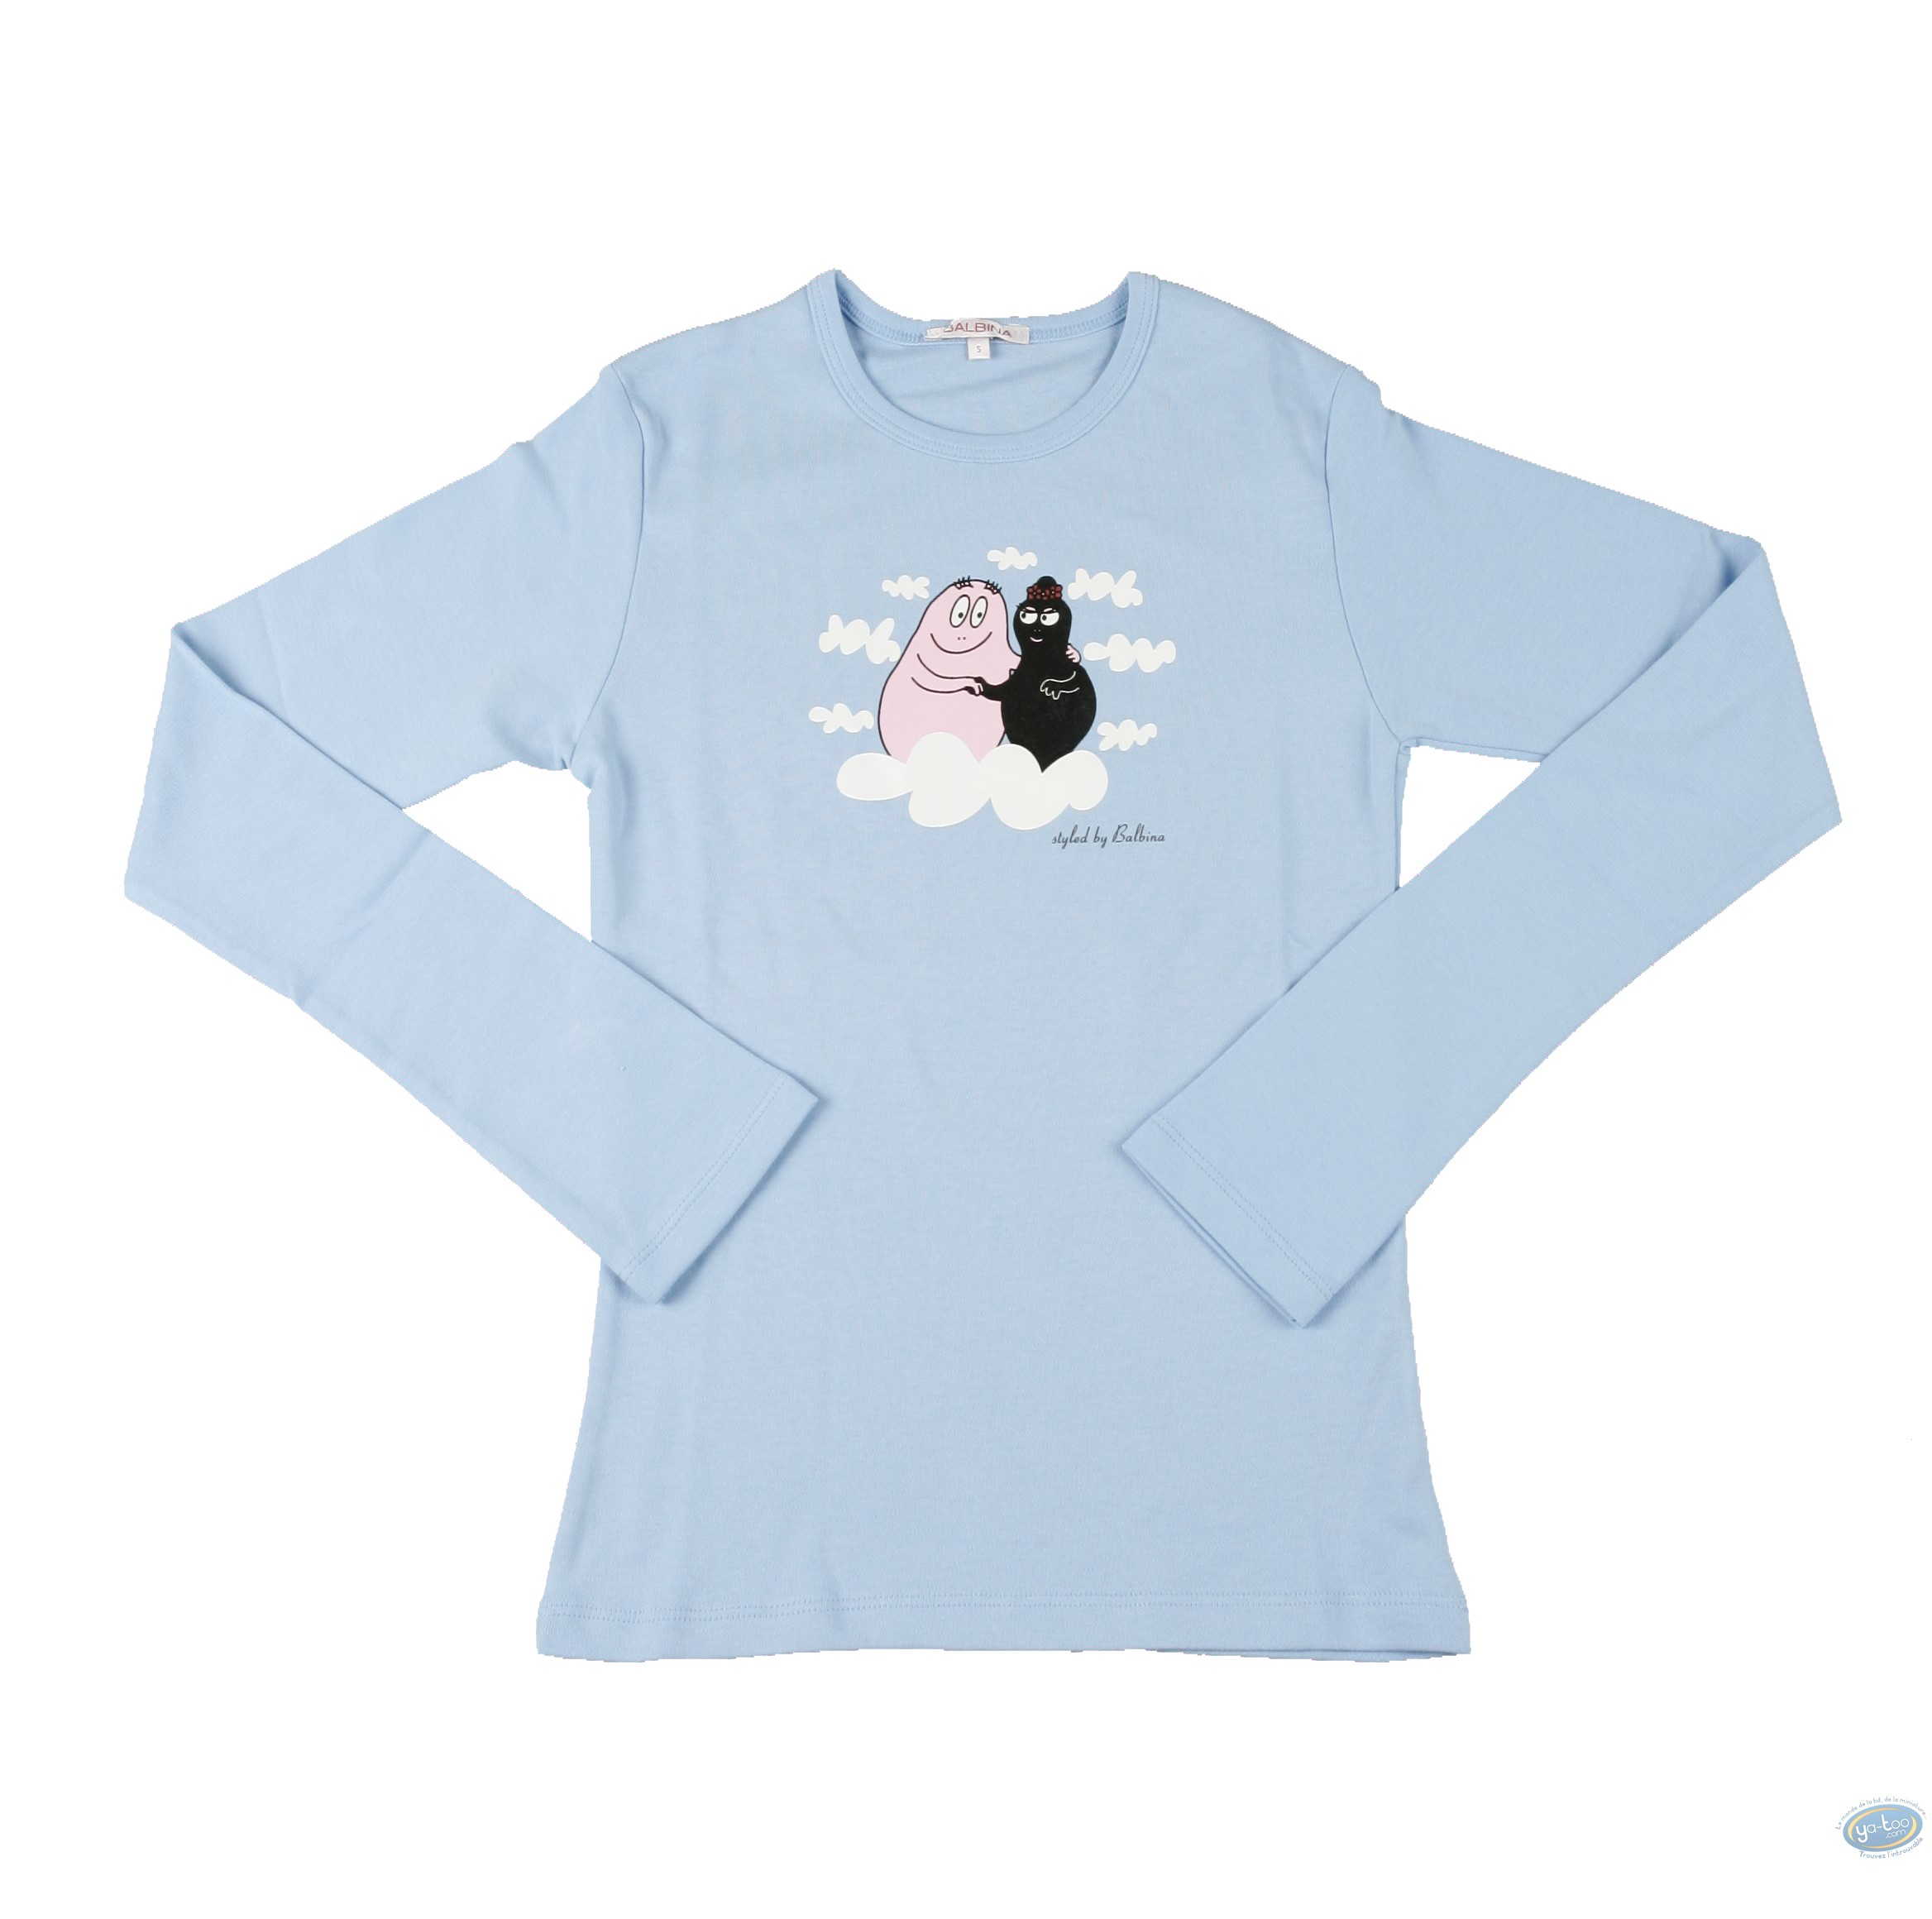 Vêtement, Barbapapa : T-shirt manches longues bleu Barbapapa: taille L, papa et maman